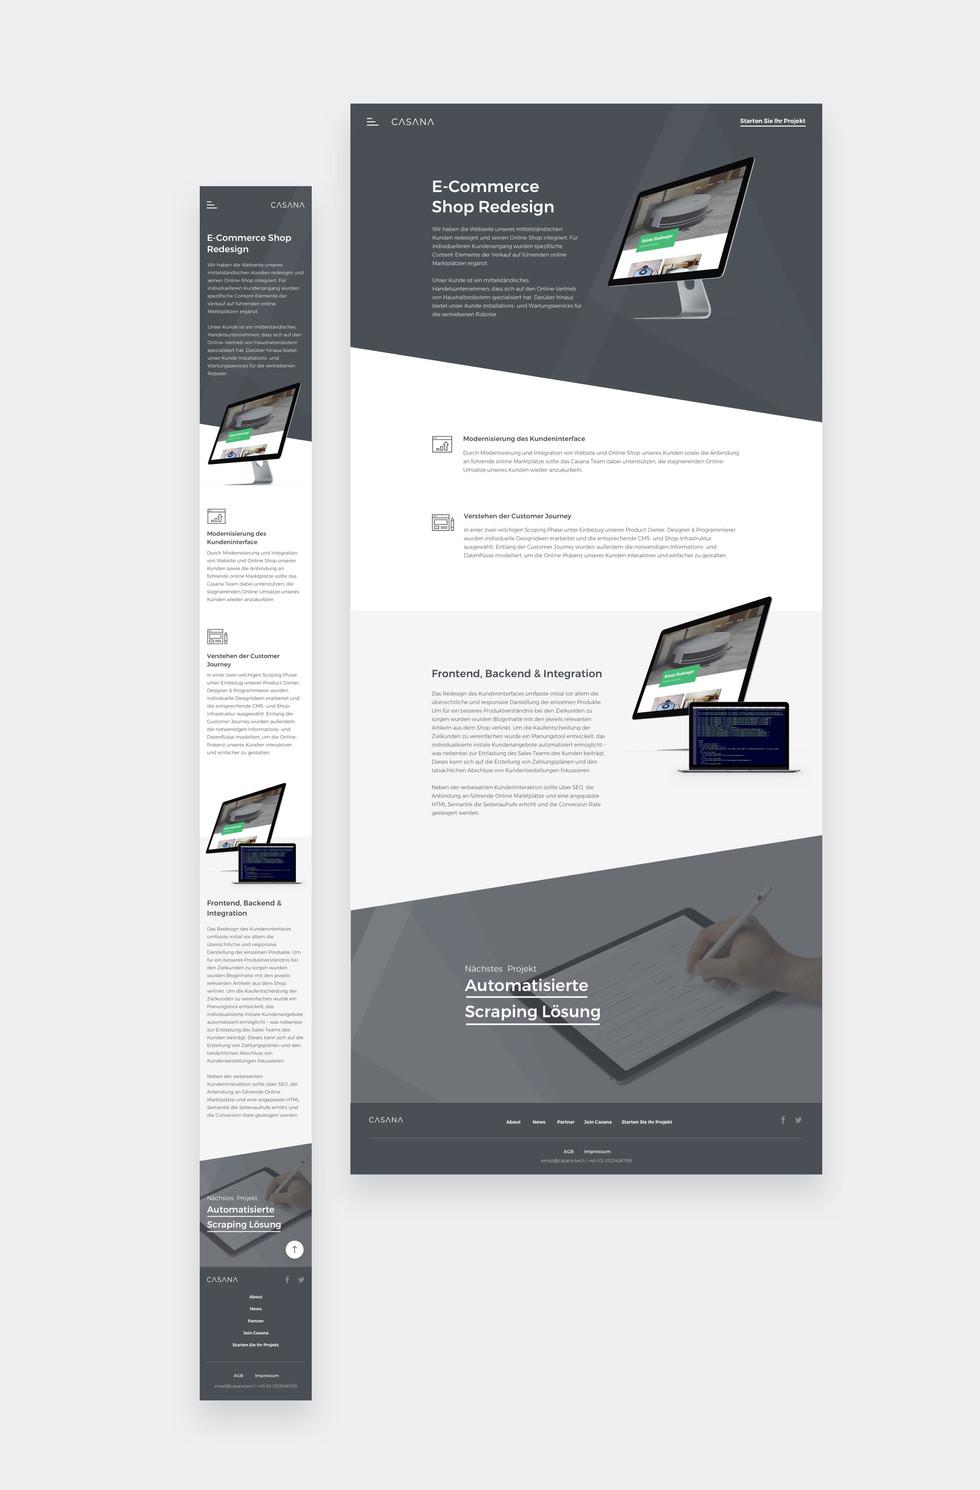 casana_website_UX_UI_Design-2.jpg